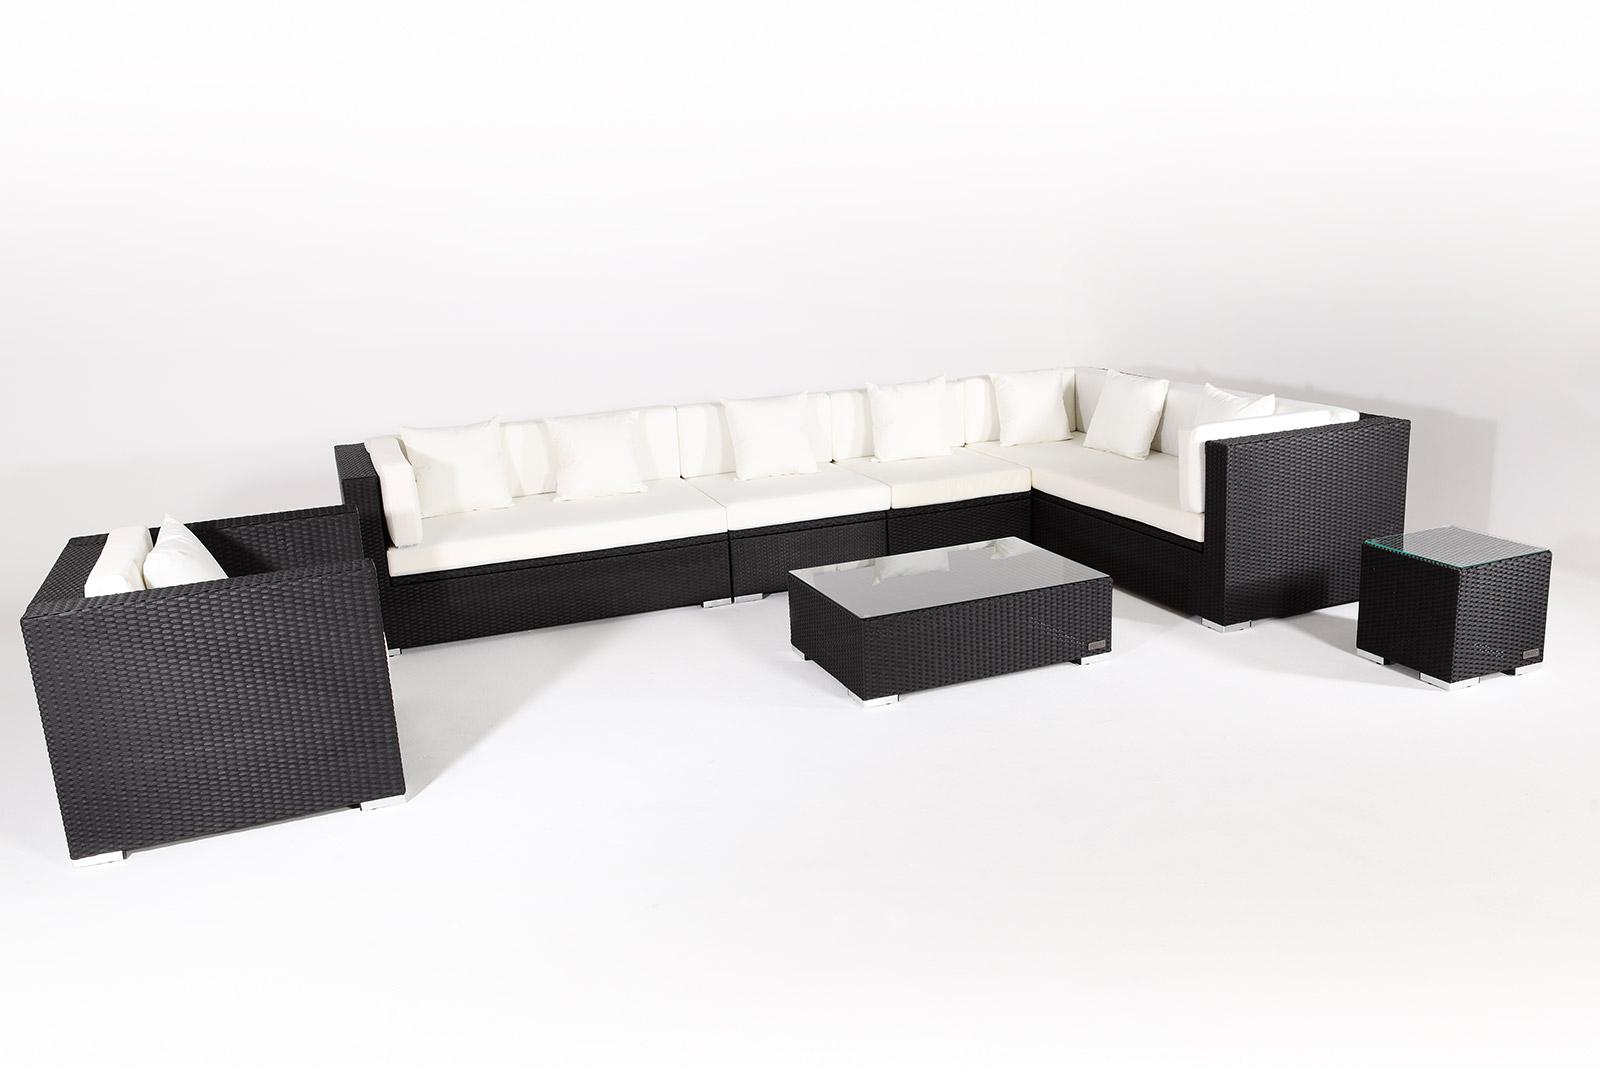 outflexx sitzgruppe xxl aus polyrattan mit kissenboxfunktion inkl kissen f r 8 pers schwarz. Black Bedroom Furniture Sets. Home Design Ideas